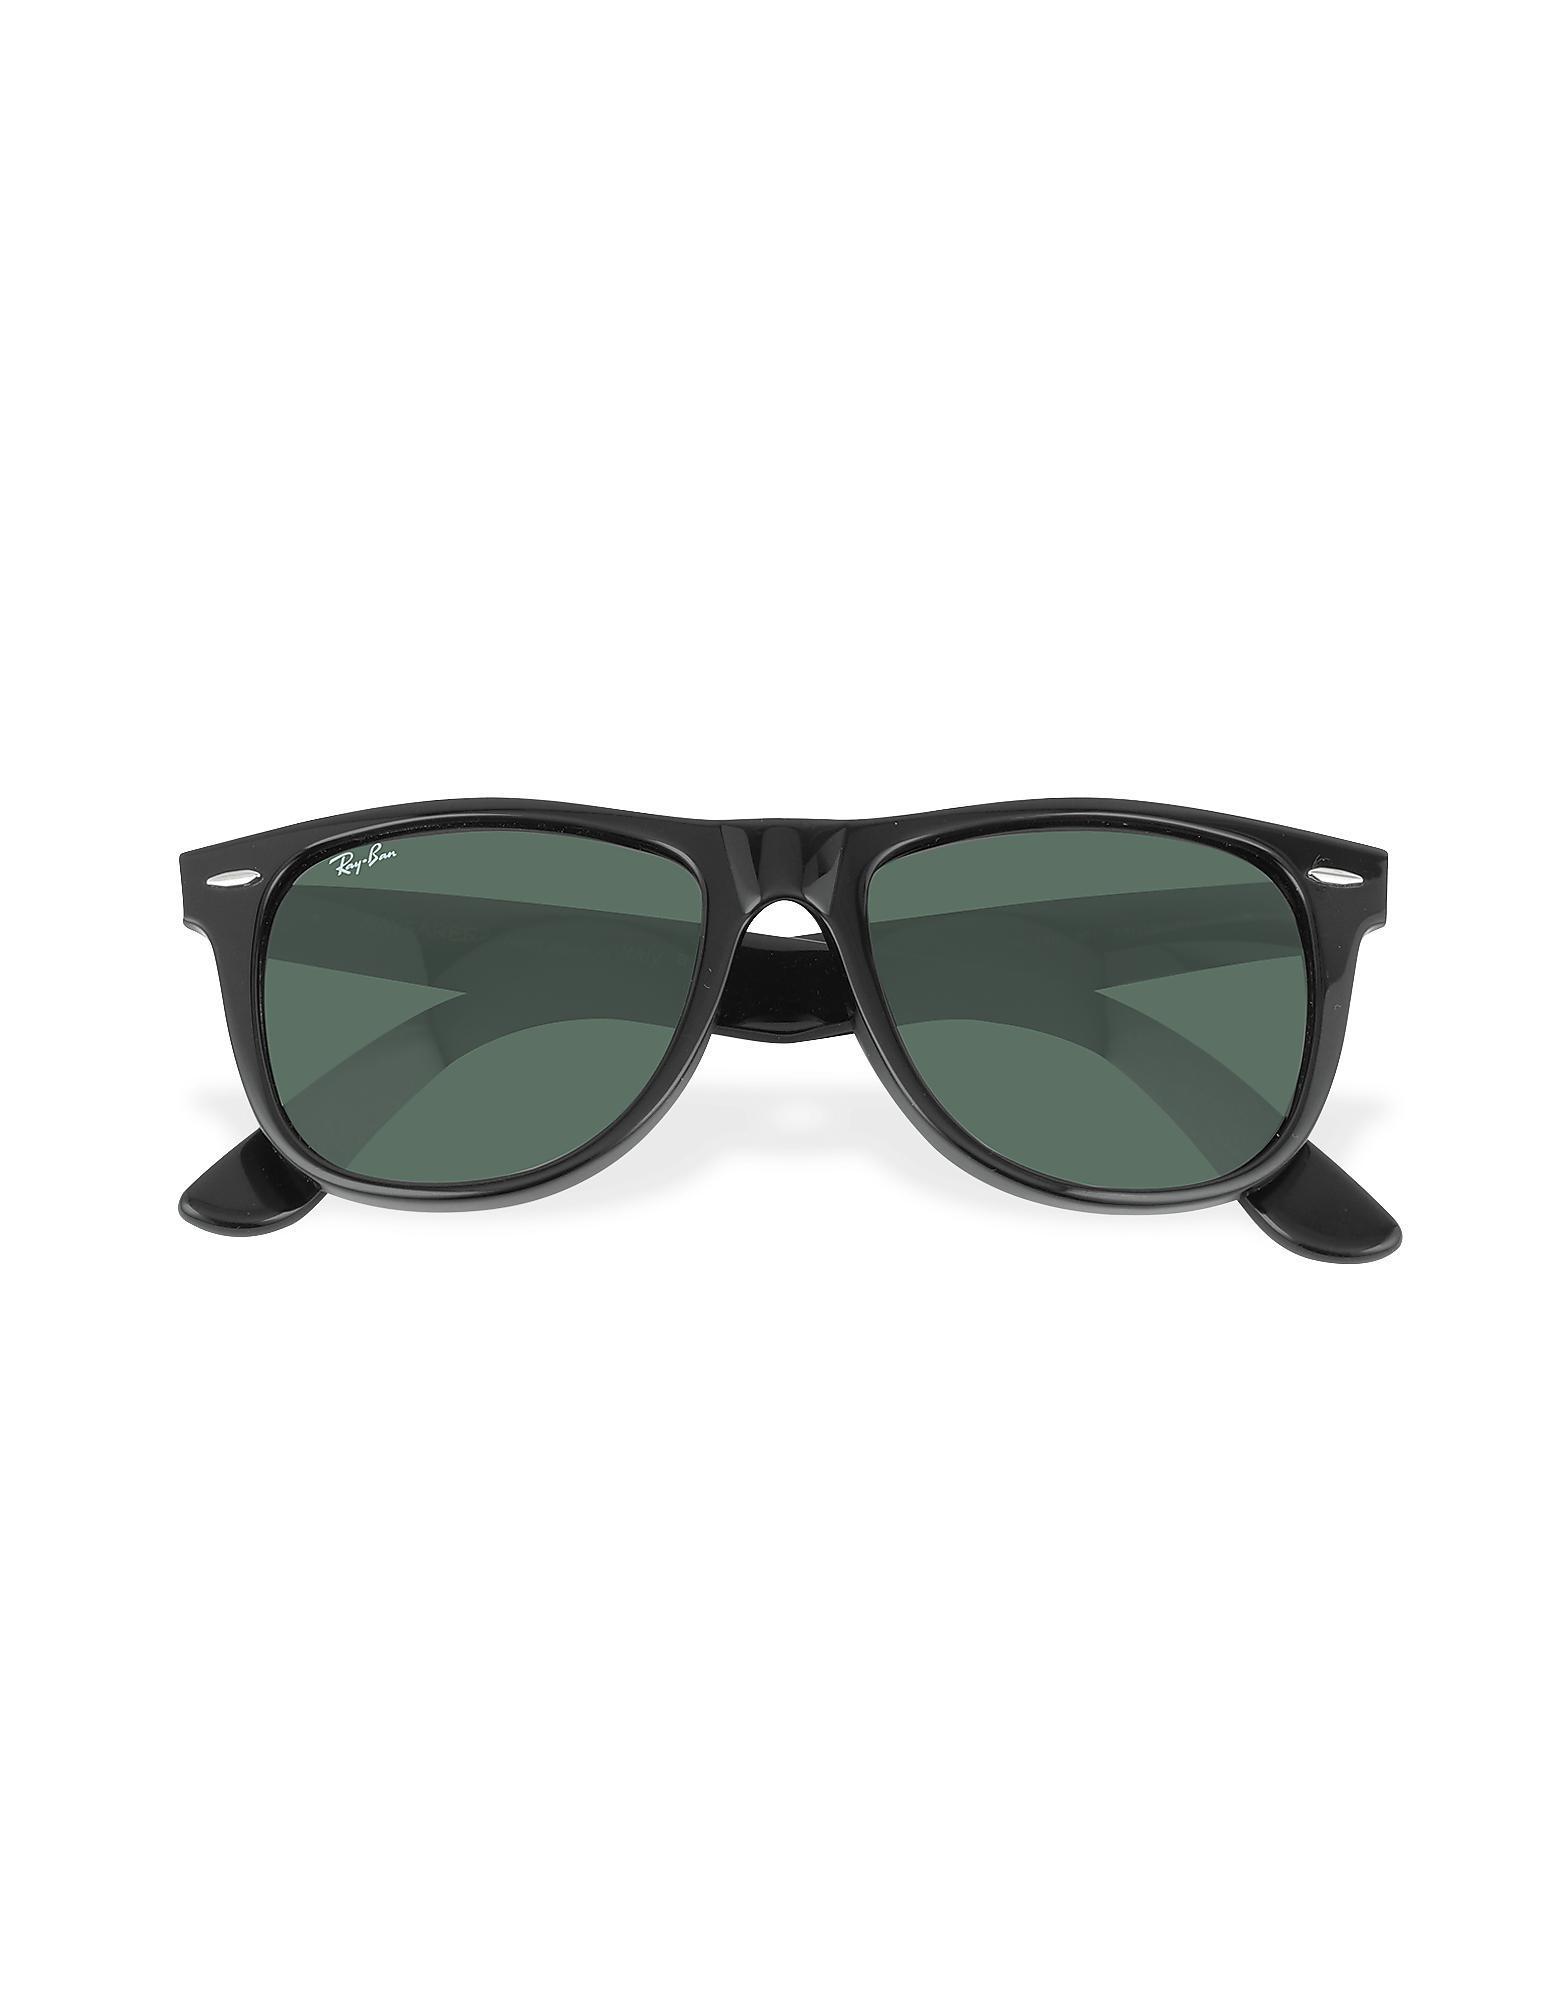 8643070bda1a6a Ray-Ban Original Wayfarer - Square Acetate Sunglasses in Black for Men -  Lyst